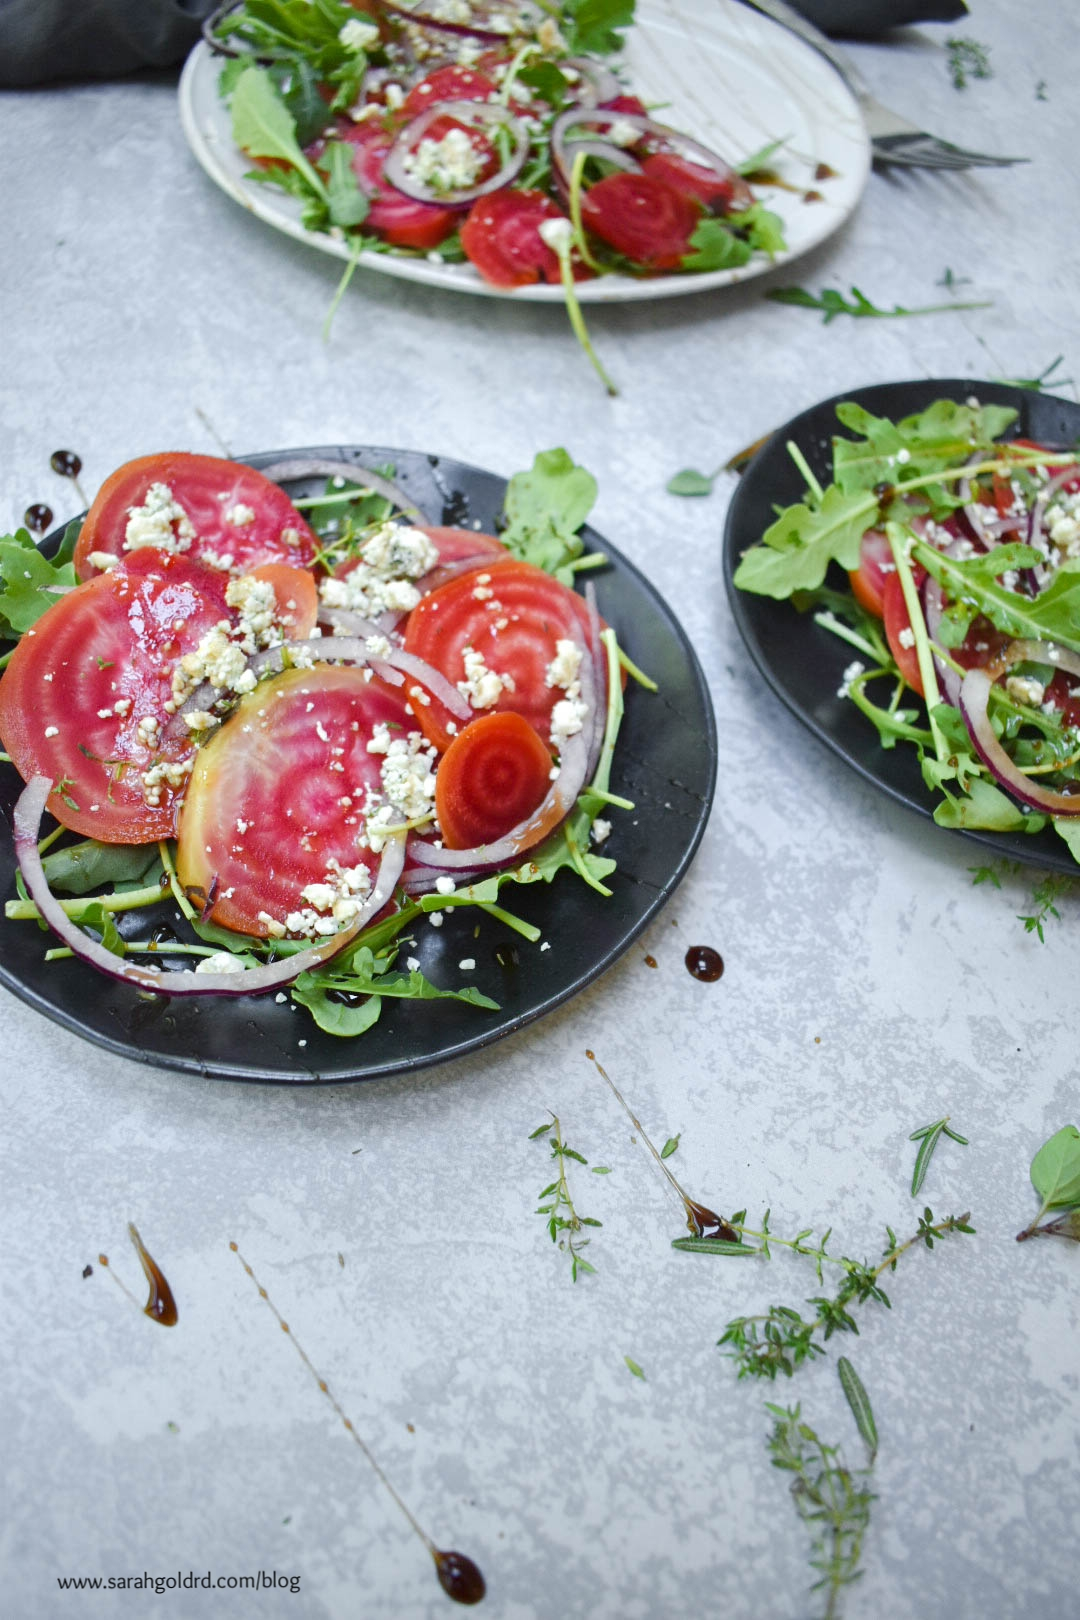 chioggia beet salad with arugula and gorgonzola.jpg